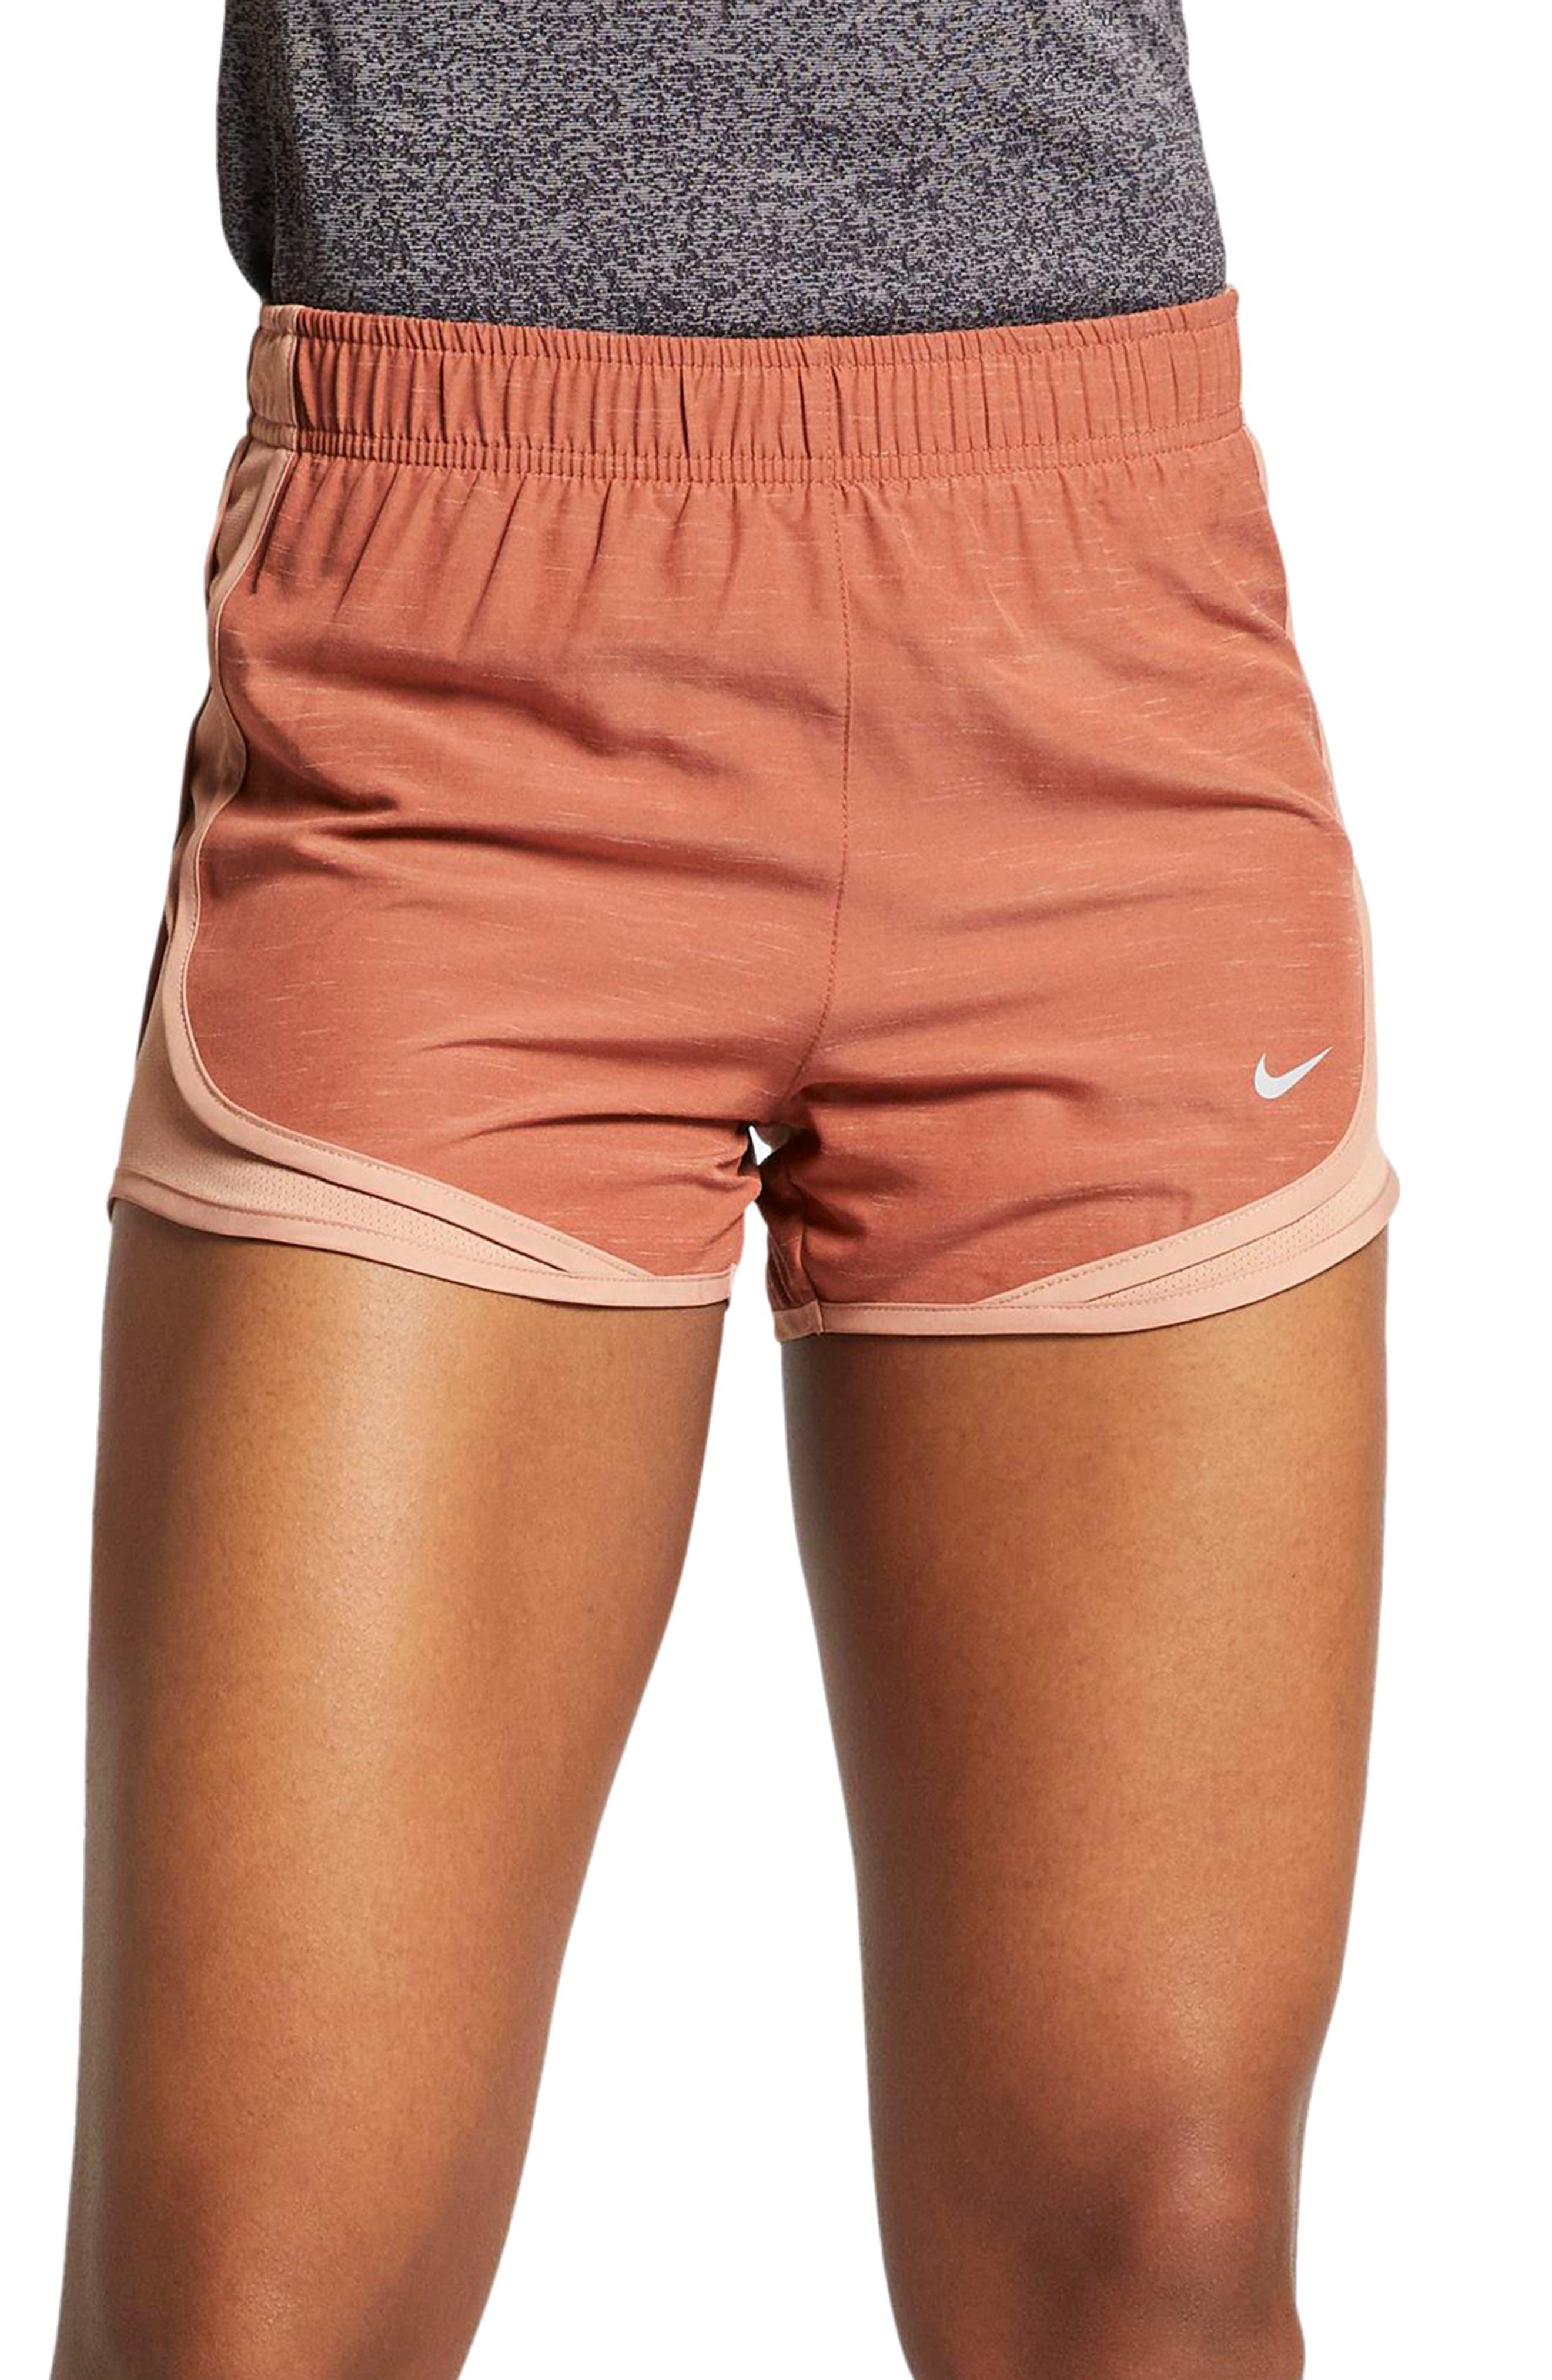 6d9726886030 running shorts